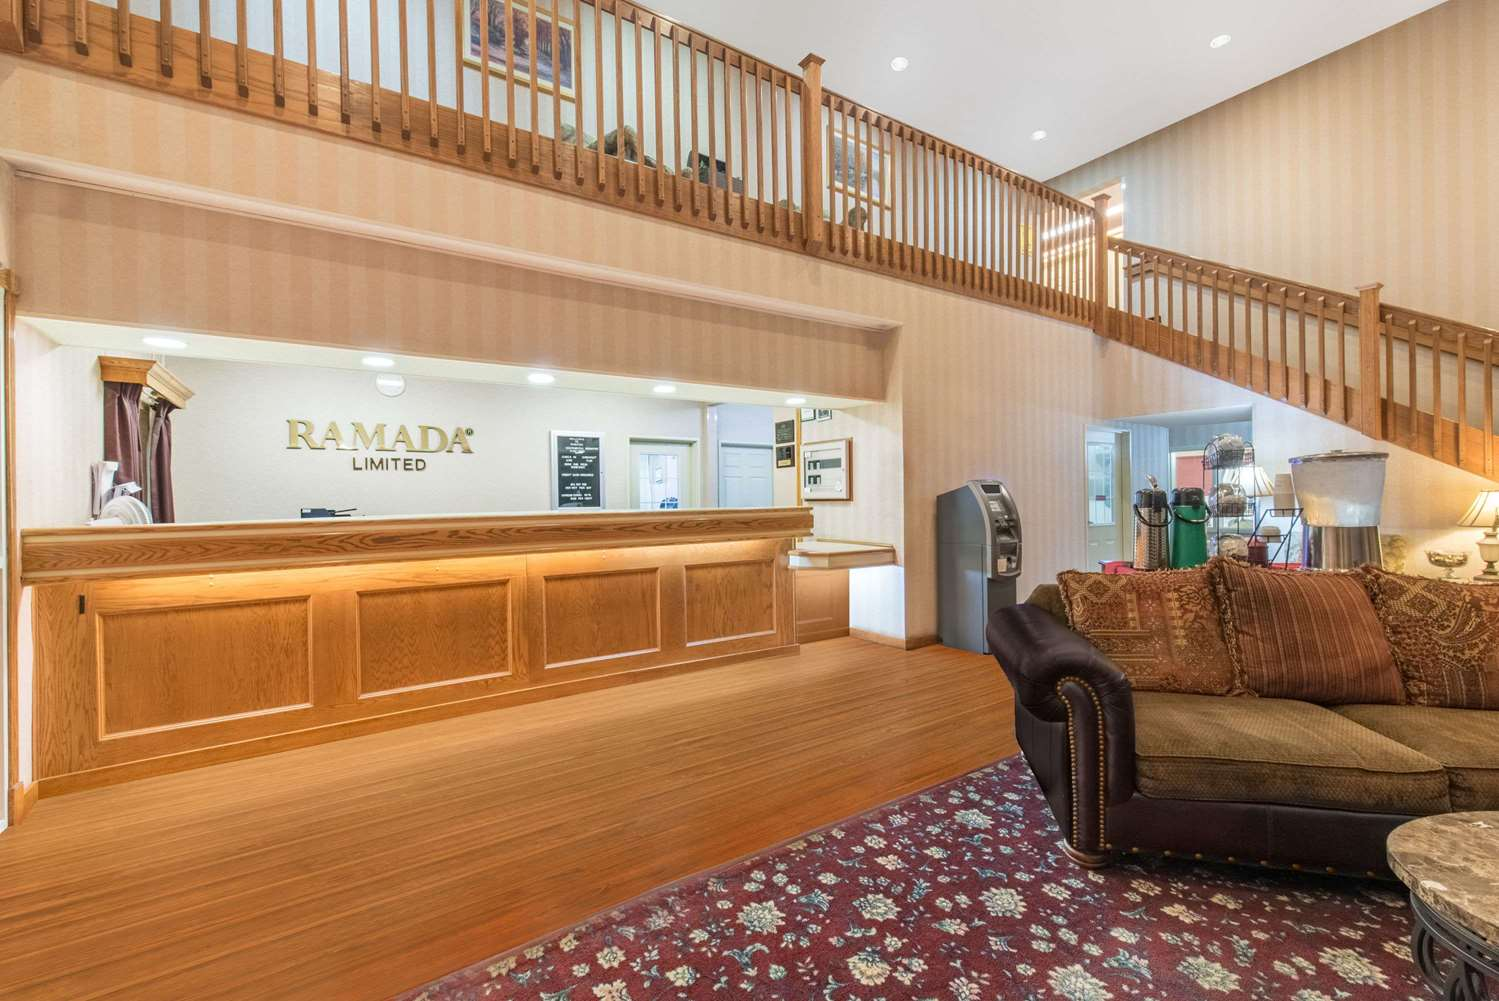 Lobby - Ramada Limited Hotel Northeast Bismarck